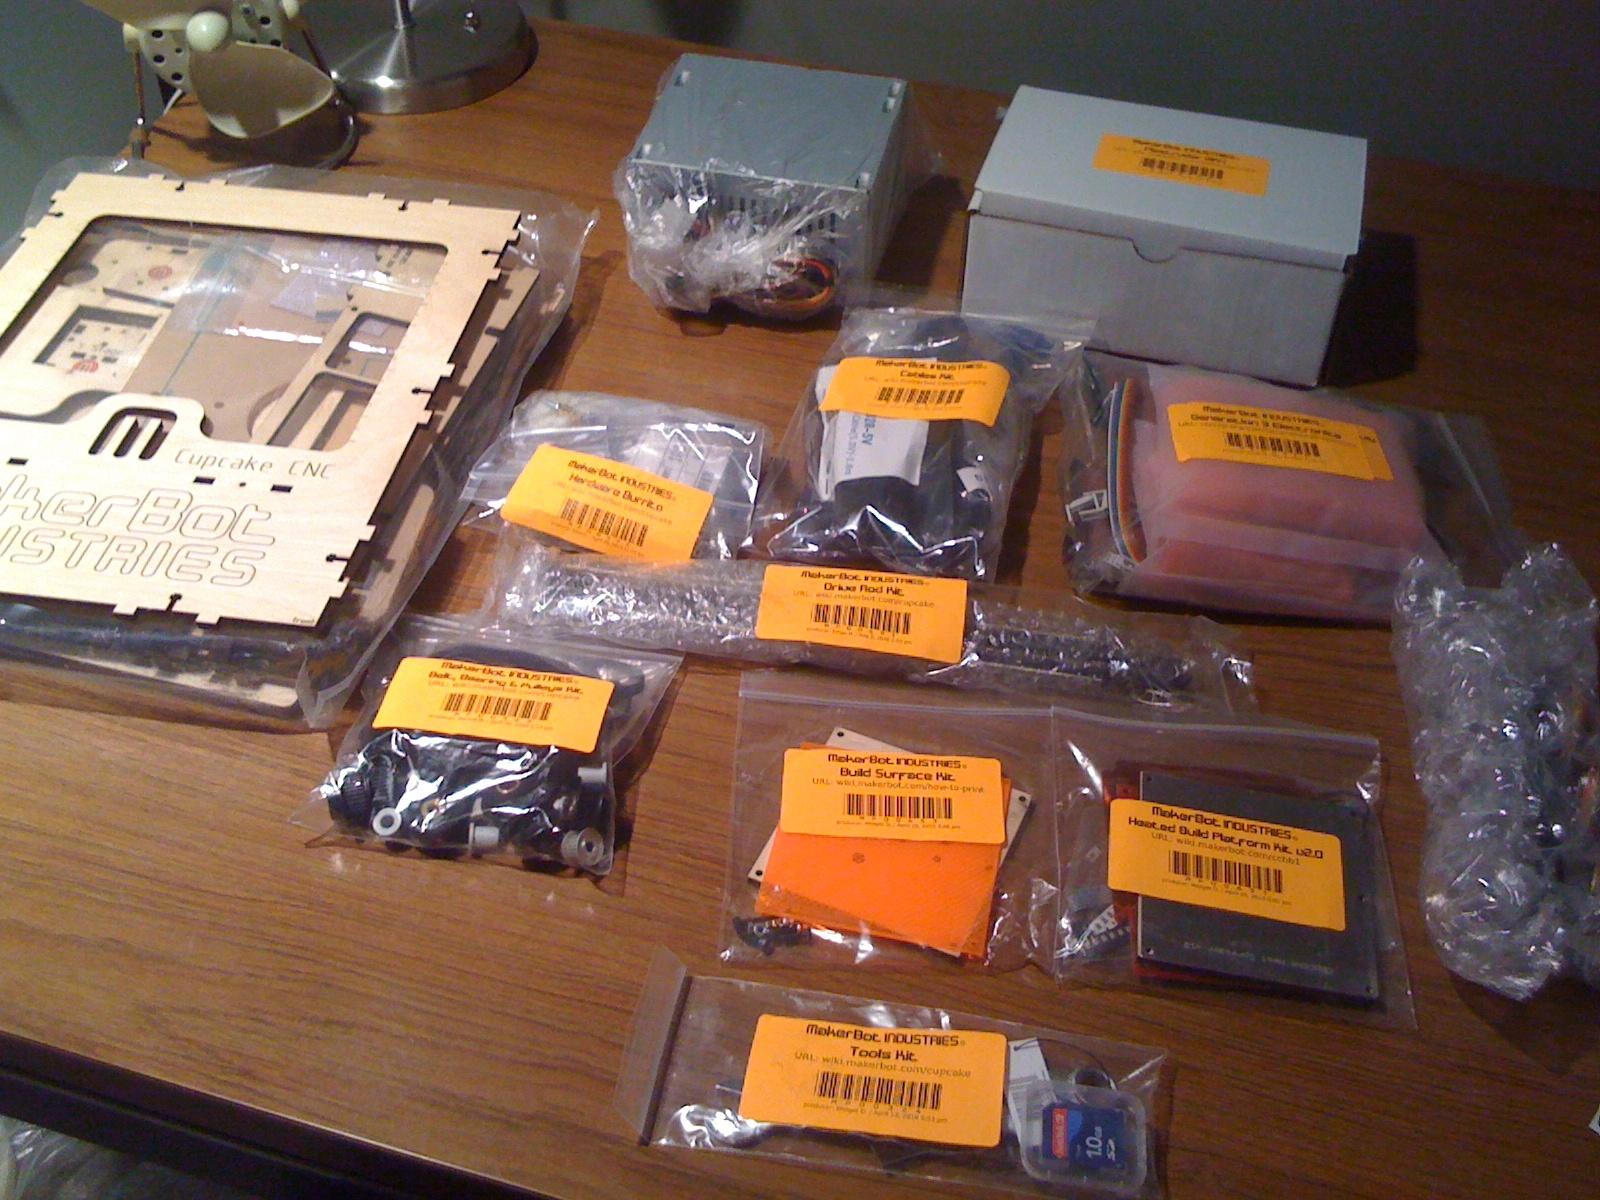 Who Buys 3D Printer Kits, Anyway?